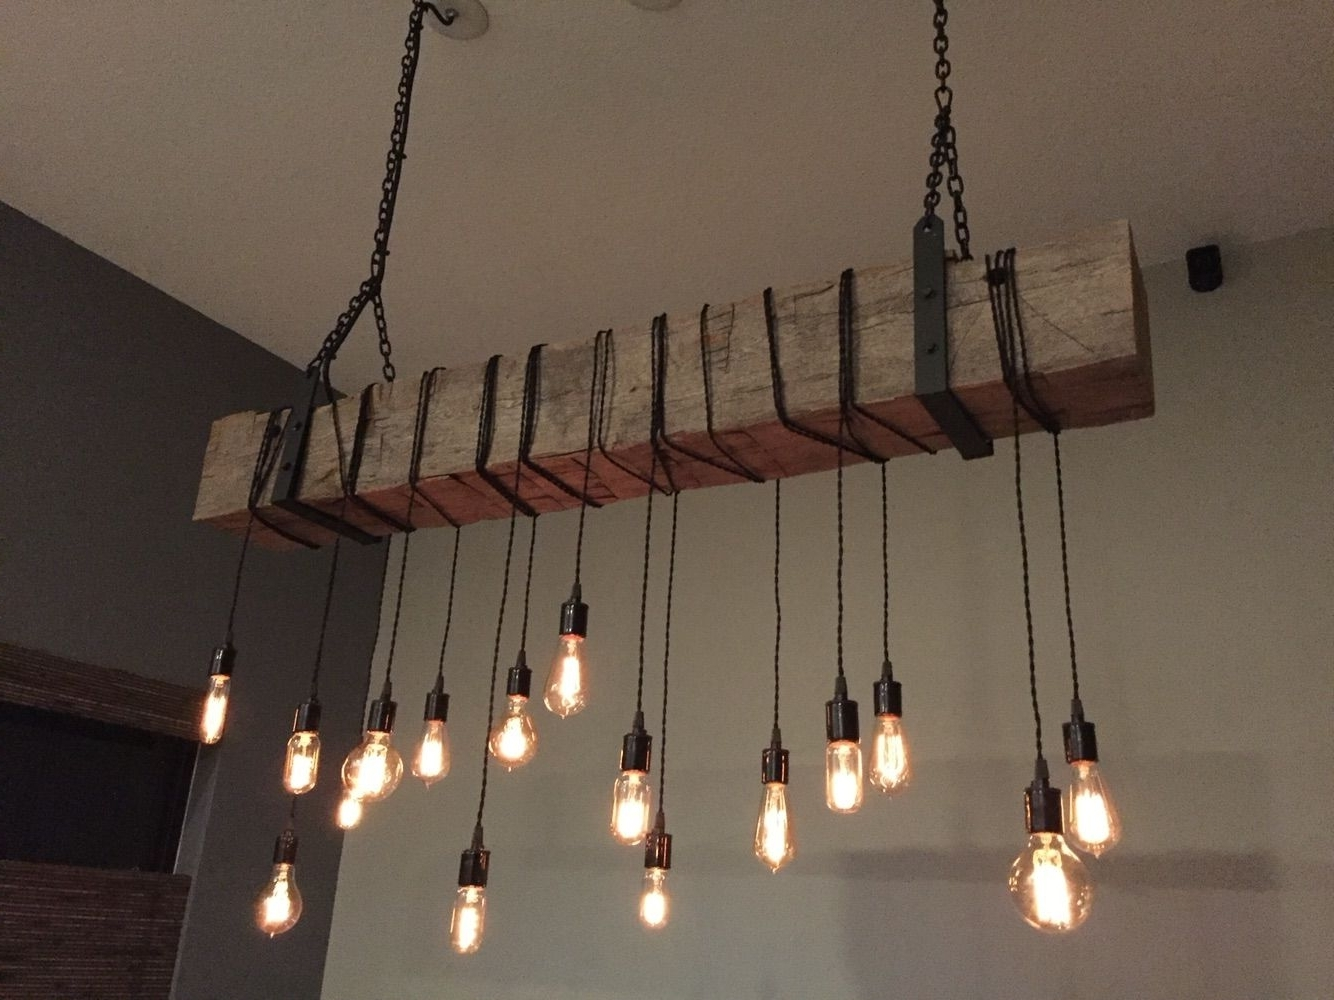 Restaurant Chandelier Intended For Well Liked Buy A Custom Reclaimed Barn Beam Chandelier Light Fixture (View 11 of 15)